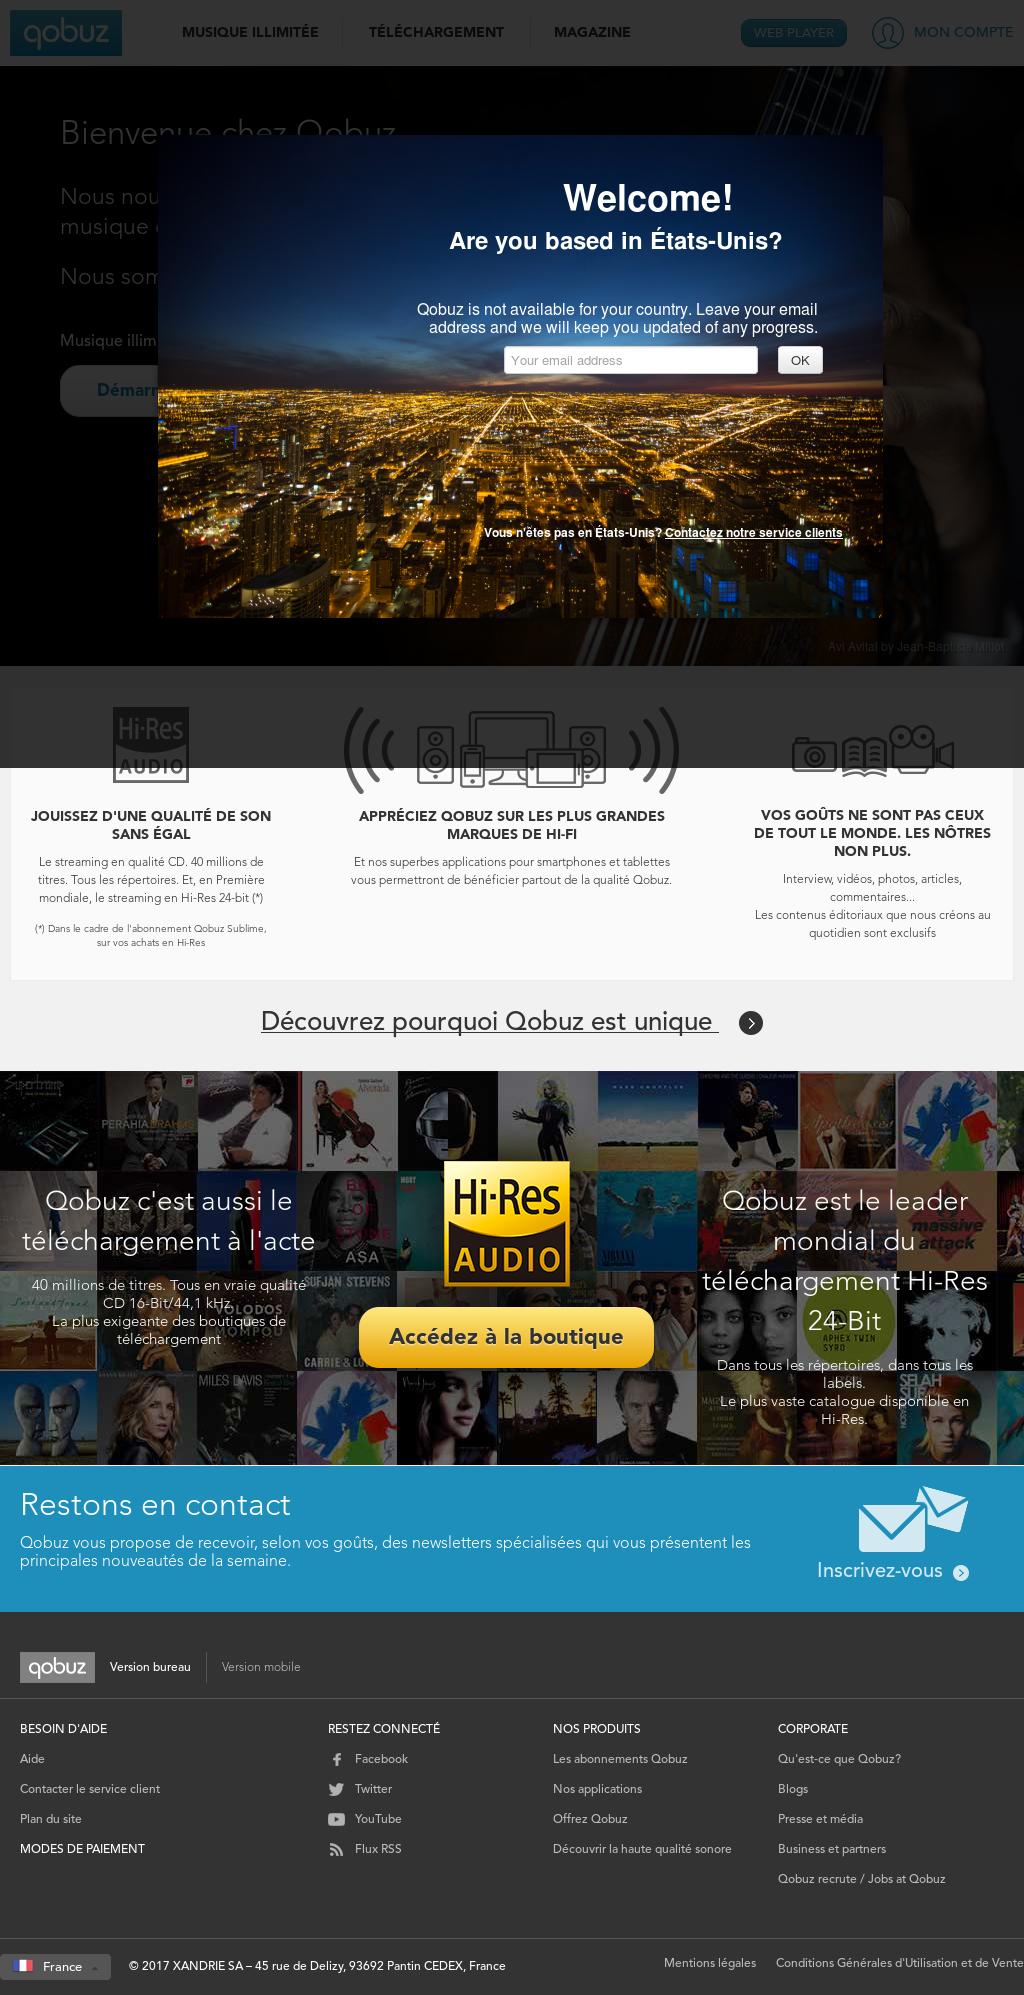 Qobuz Competitors, Revenue and Employees - Owler Company Profile